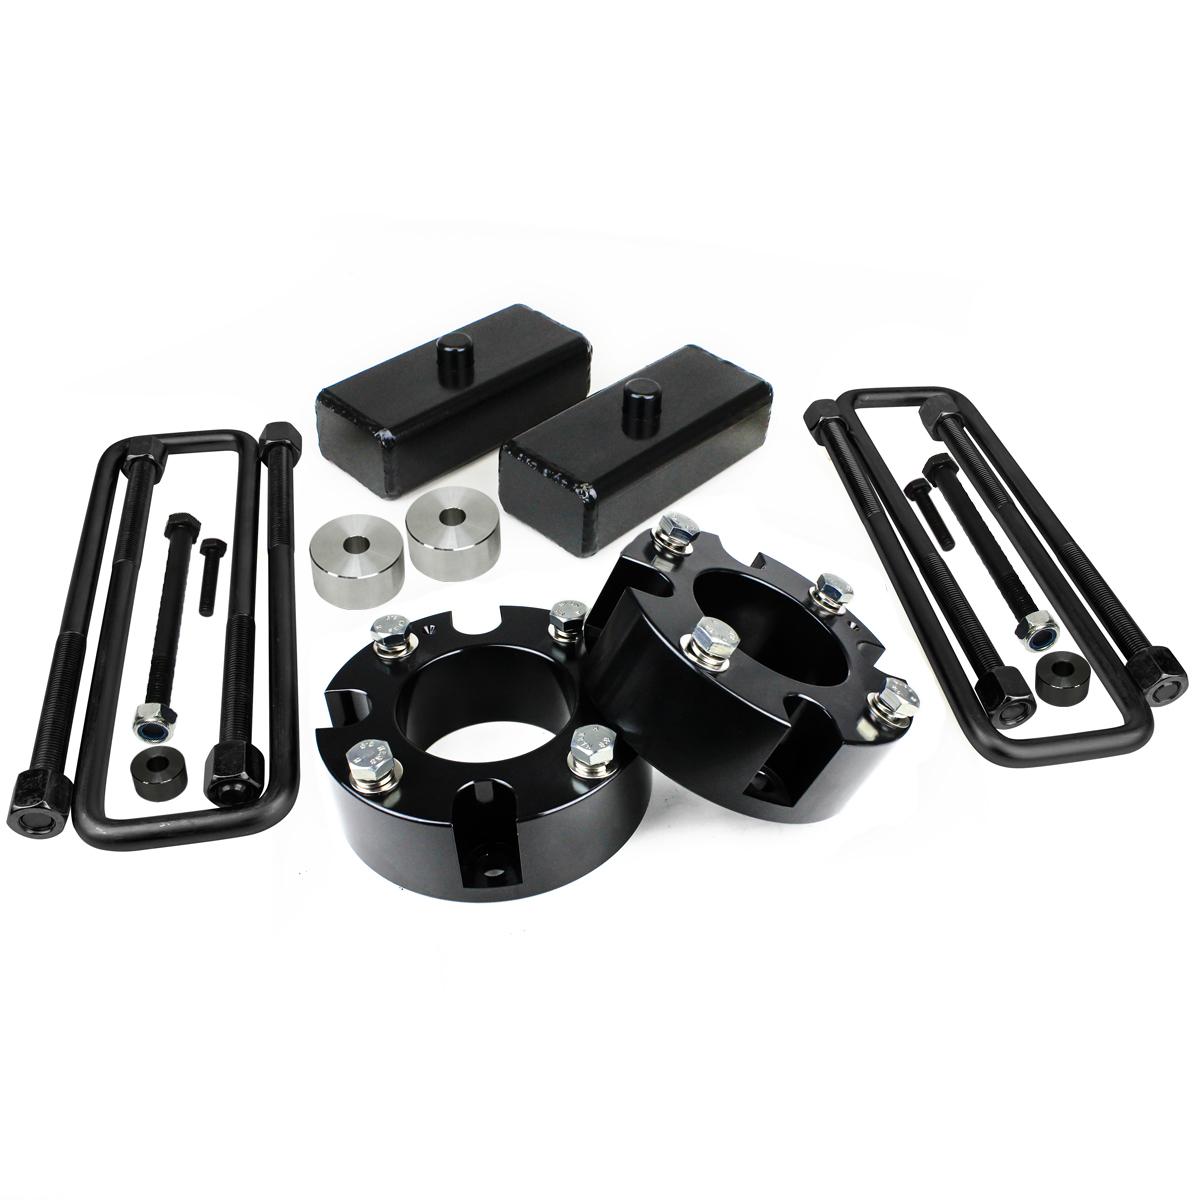 "3/"" Front 1/"" Rear Block Lift Kit for Toyota Tundra 2007-2018"